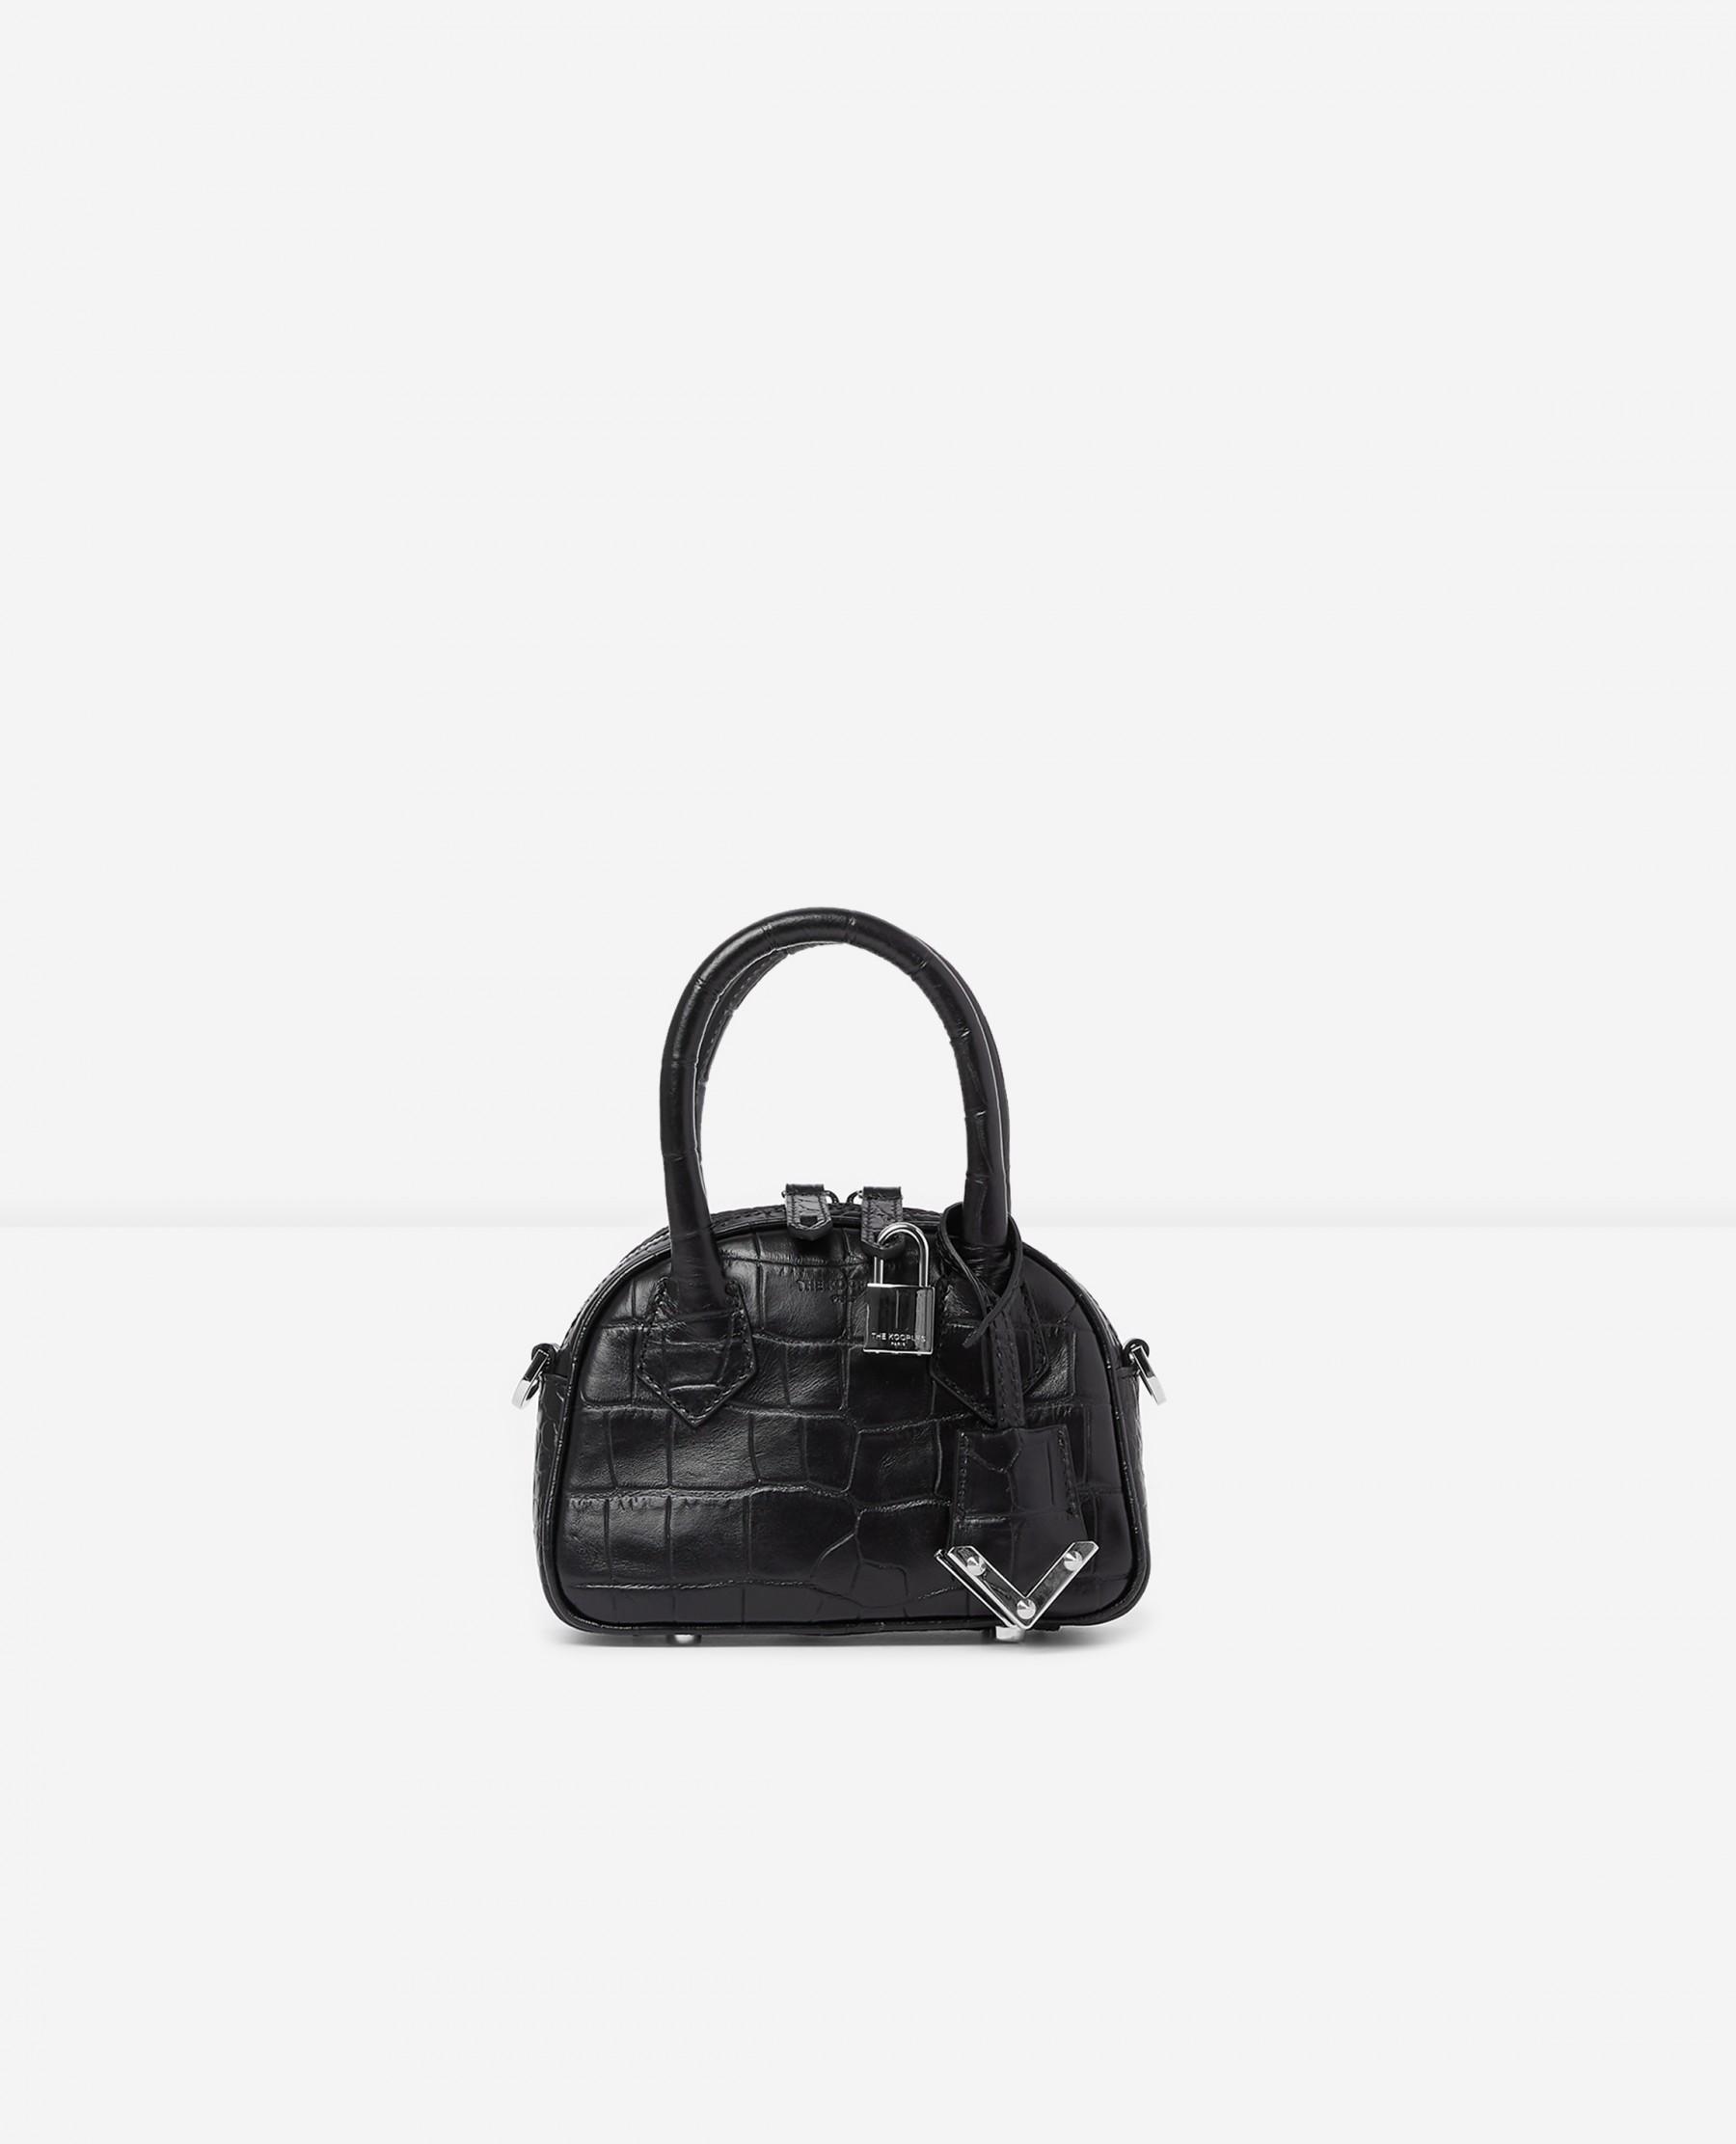 The Kooples United States Official Website - Black crocodile-print nano bag Irina by The Kooples